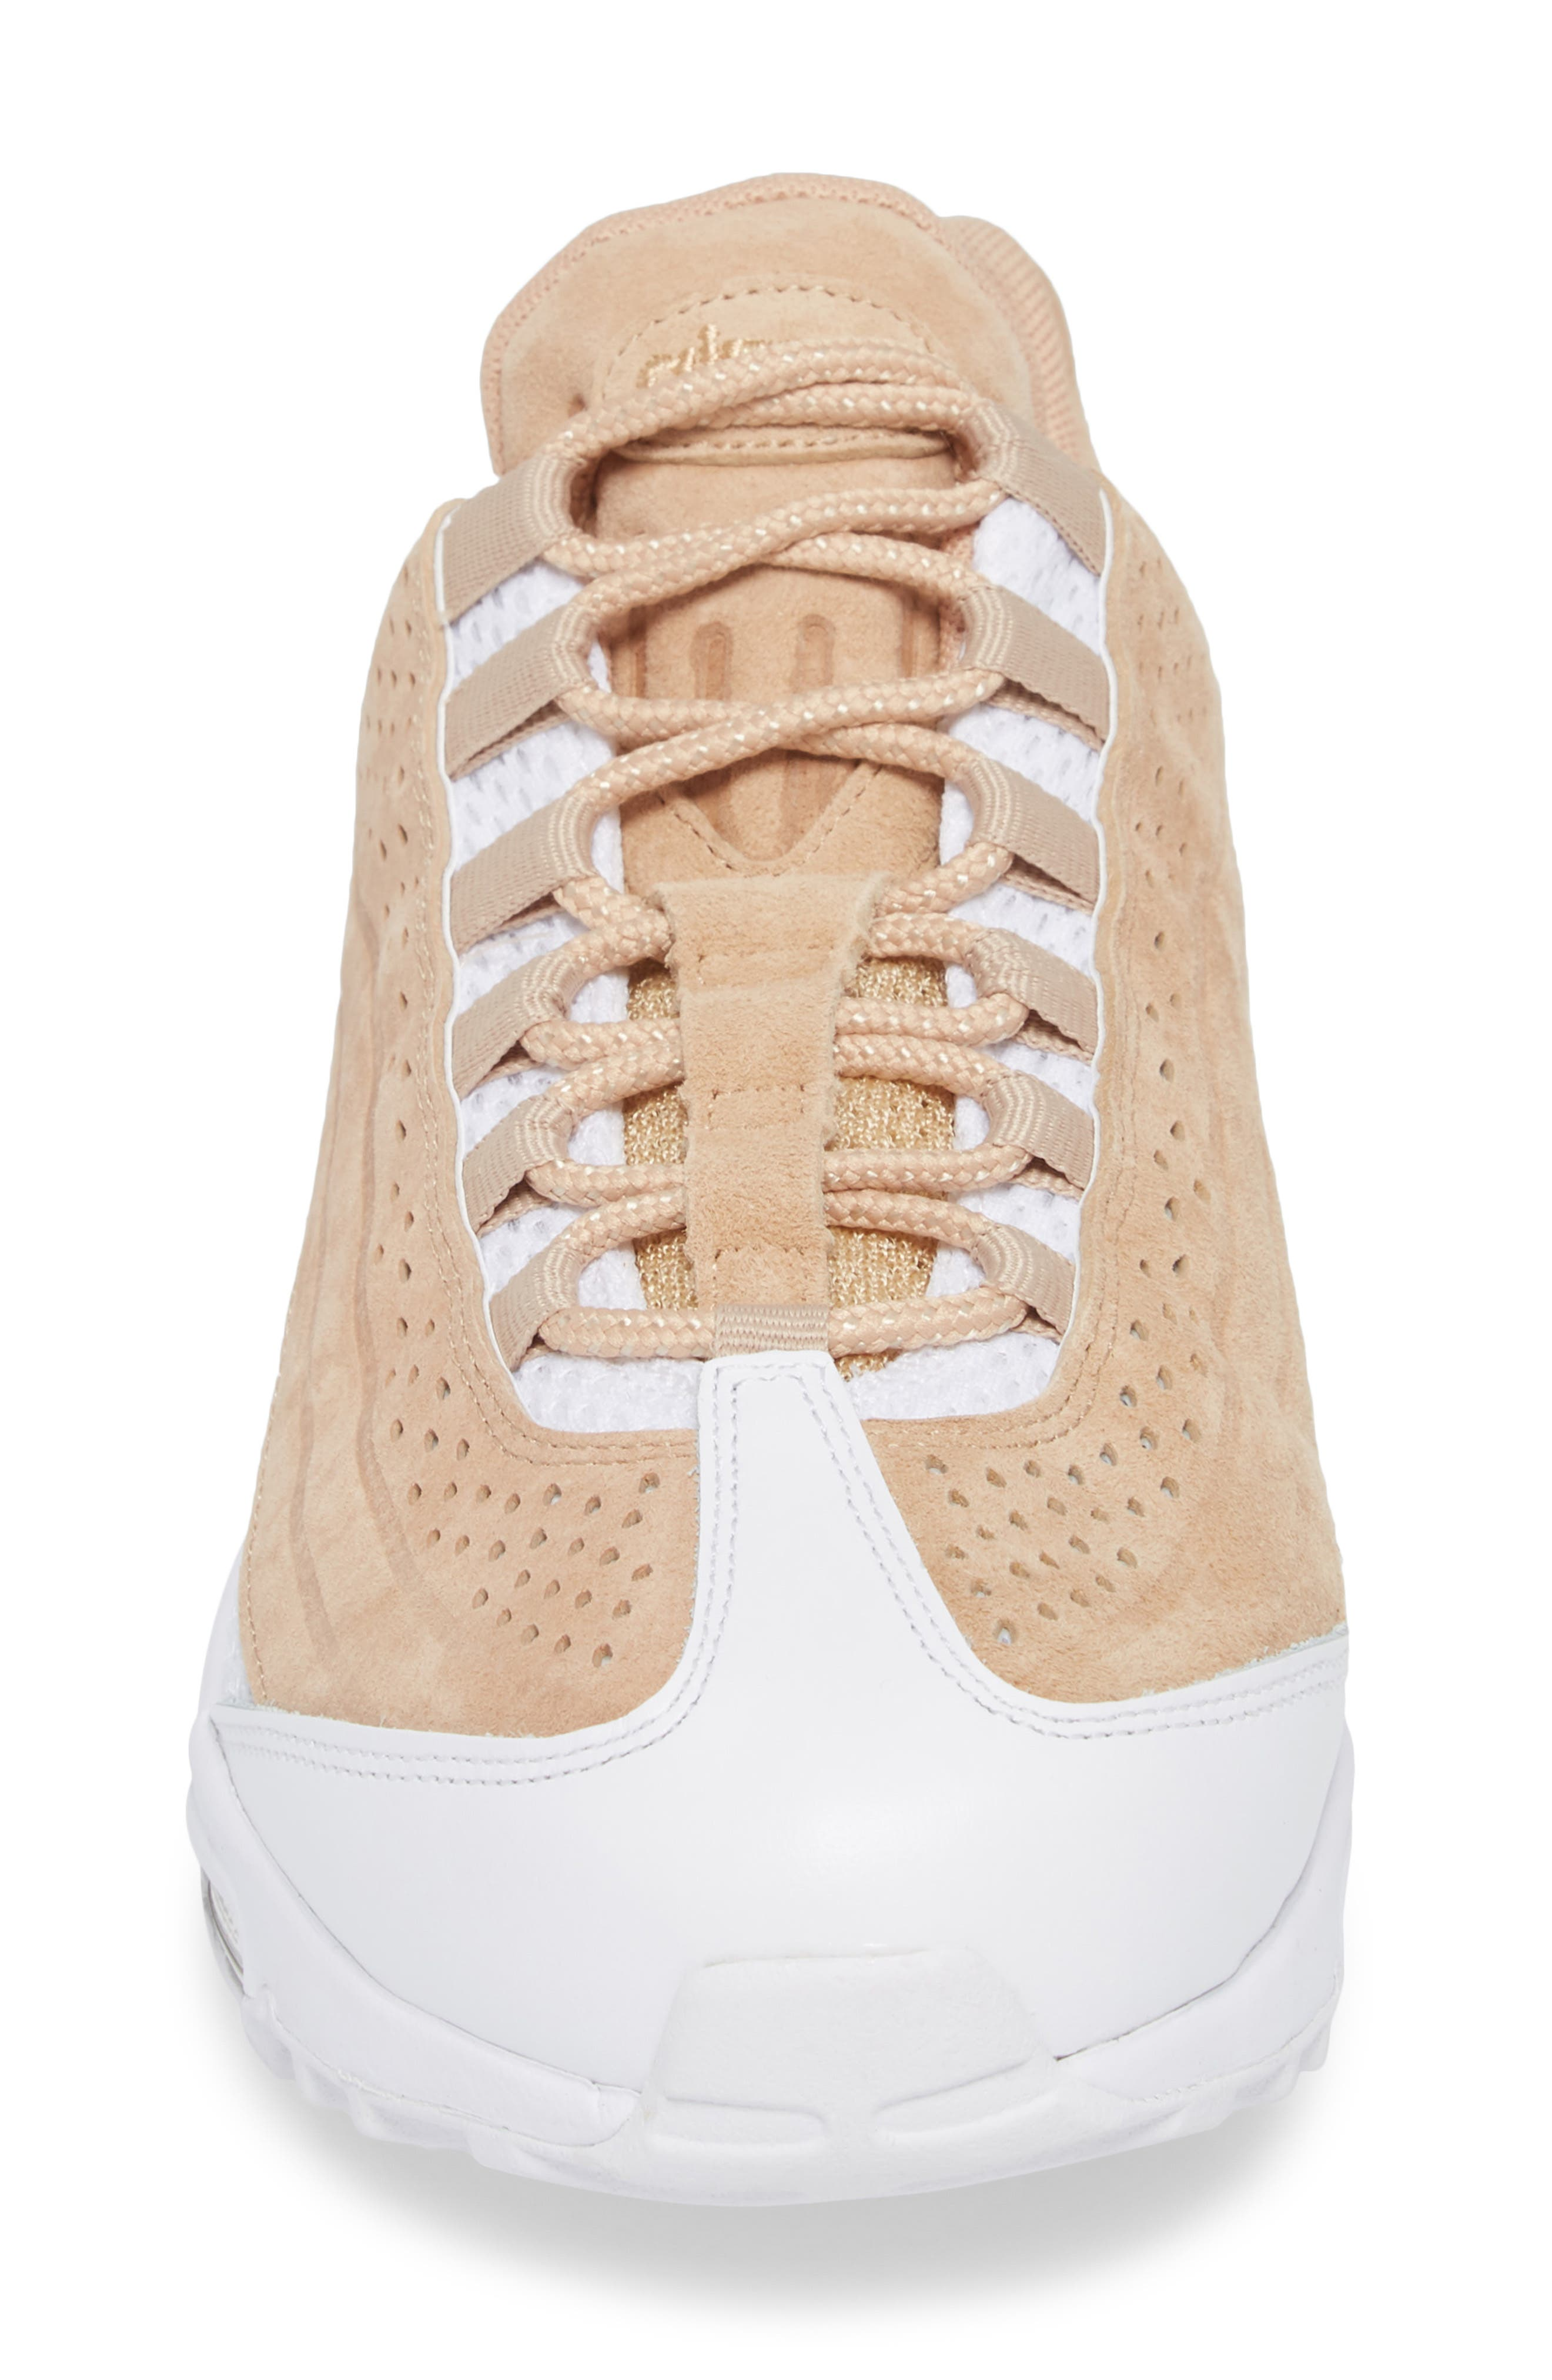 Air Max 95 Ultra Premium Sneaker,                             Alternate thumbnail 4, color,                             Vachetta Tan/ White